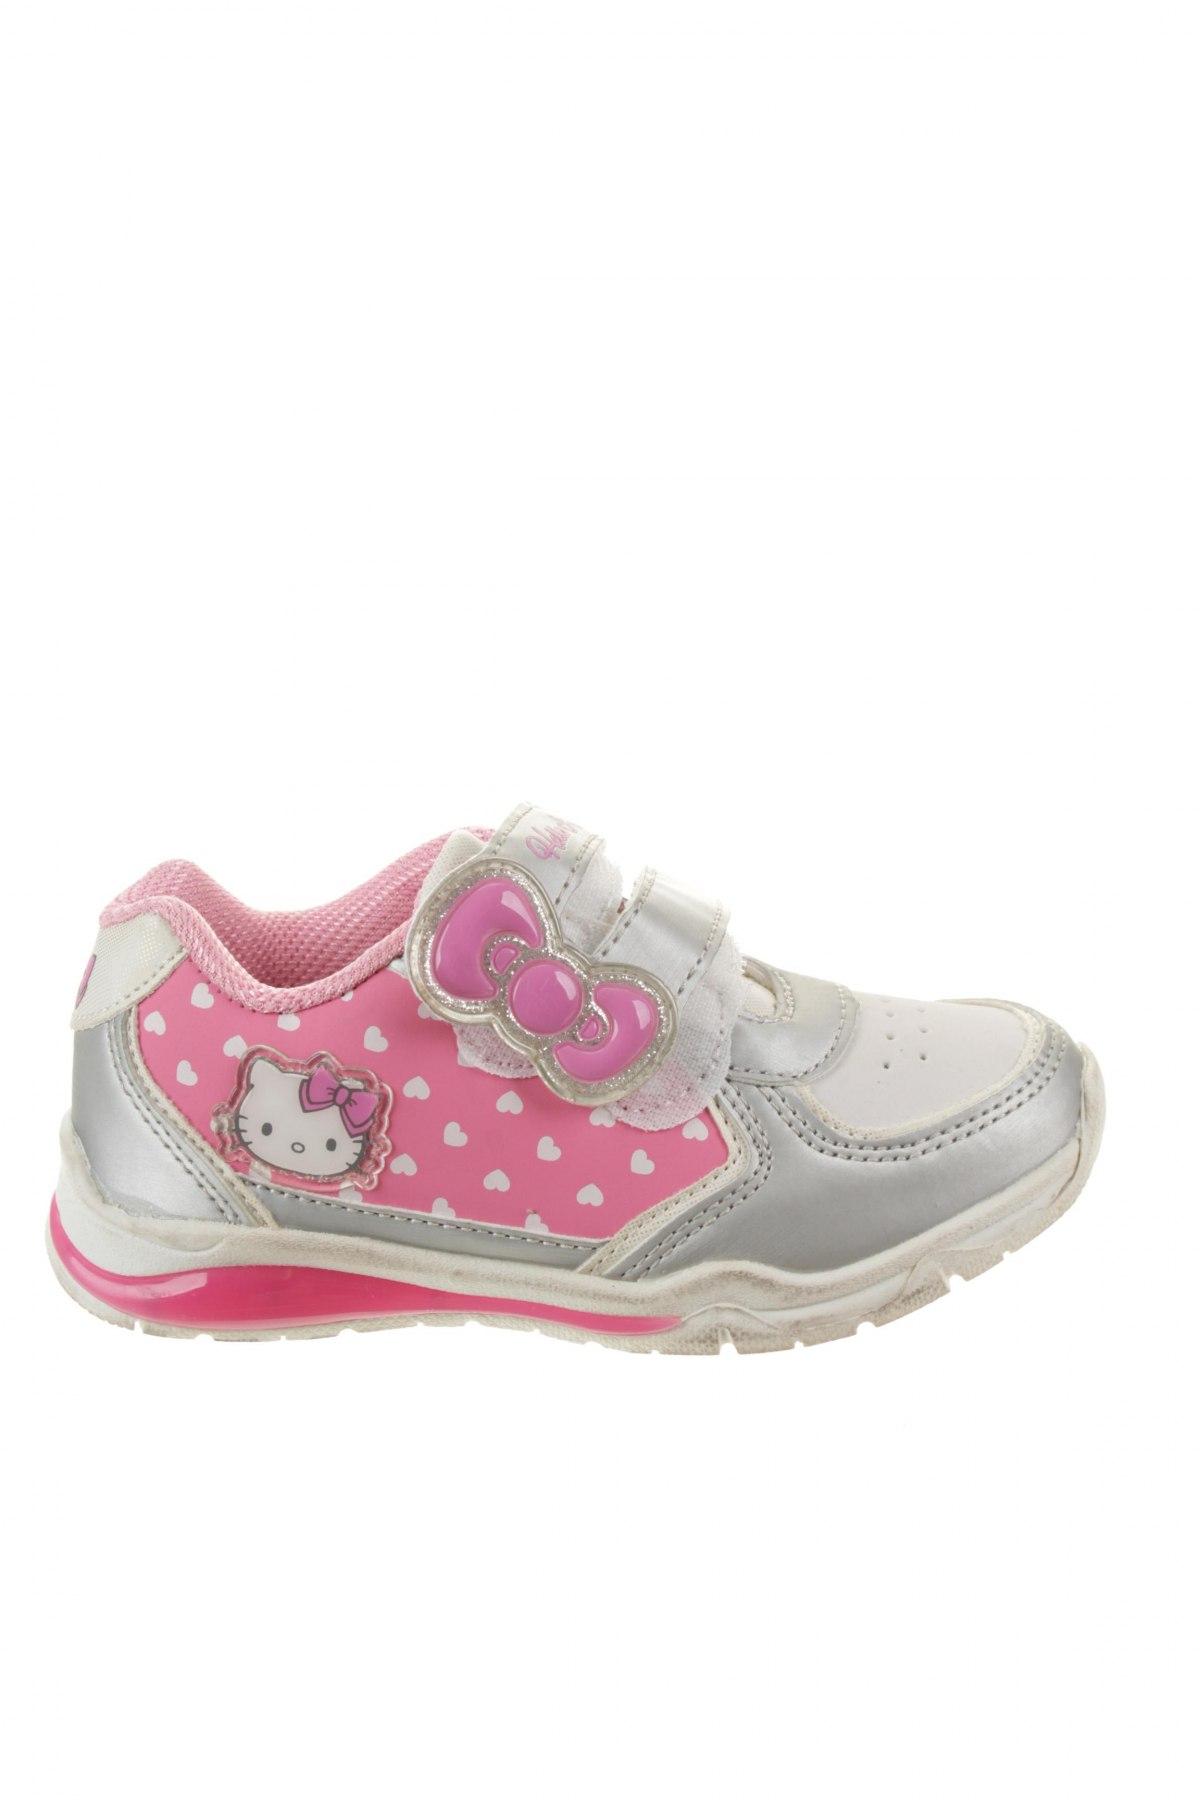 16017e4c956 Παιδικά παπούτσια Hello Kitty - σε συμφέρουσα τιμή στο Remix ...